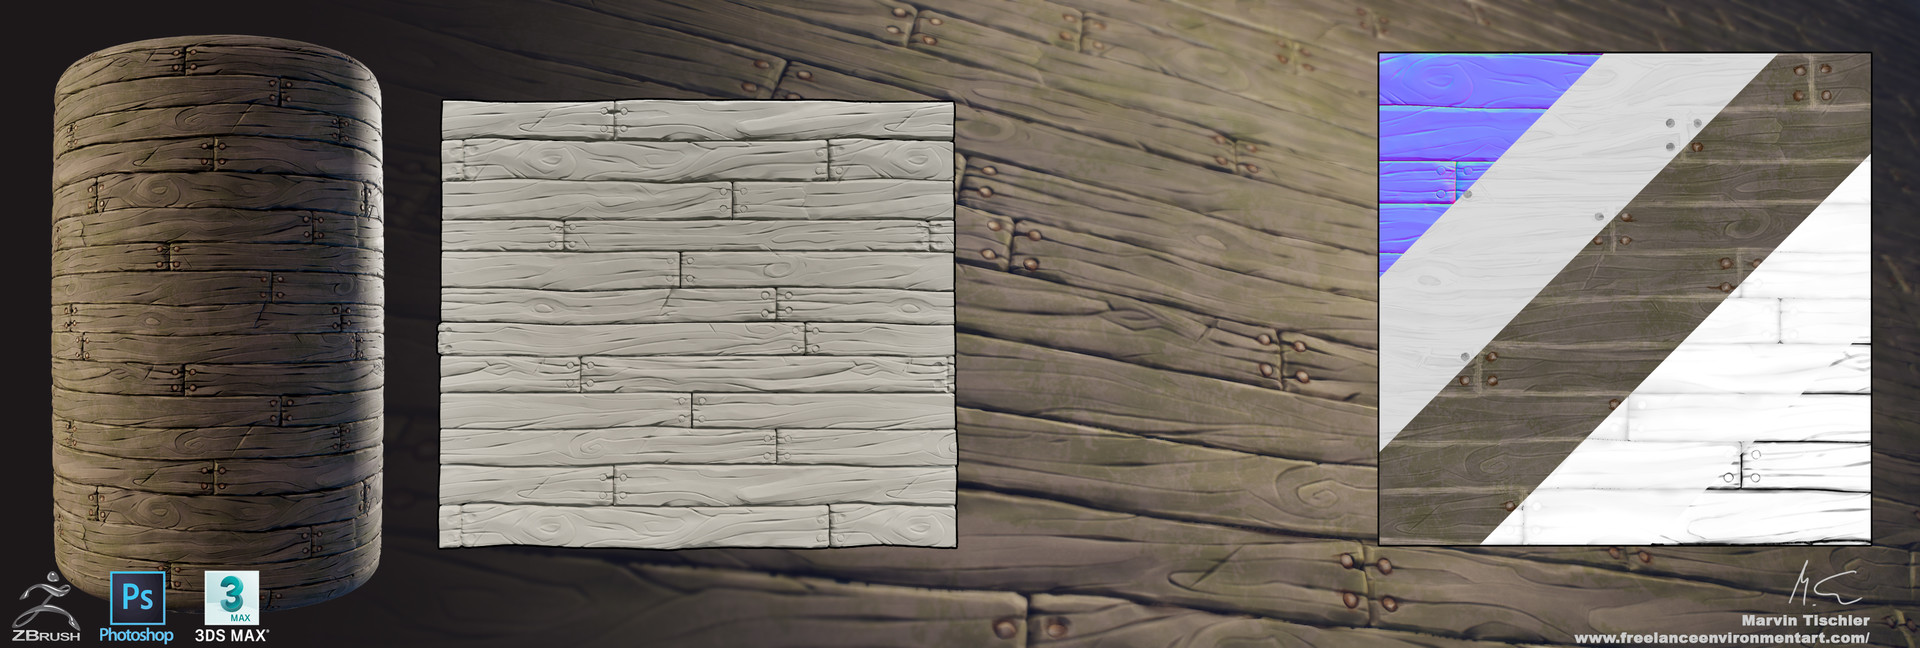 Marvin tischler handpainted textures 002 g